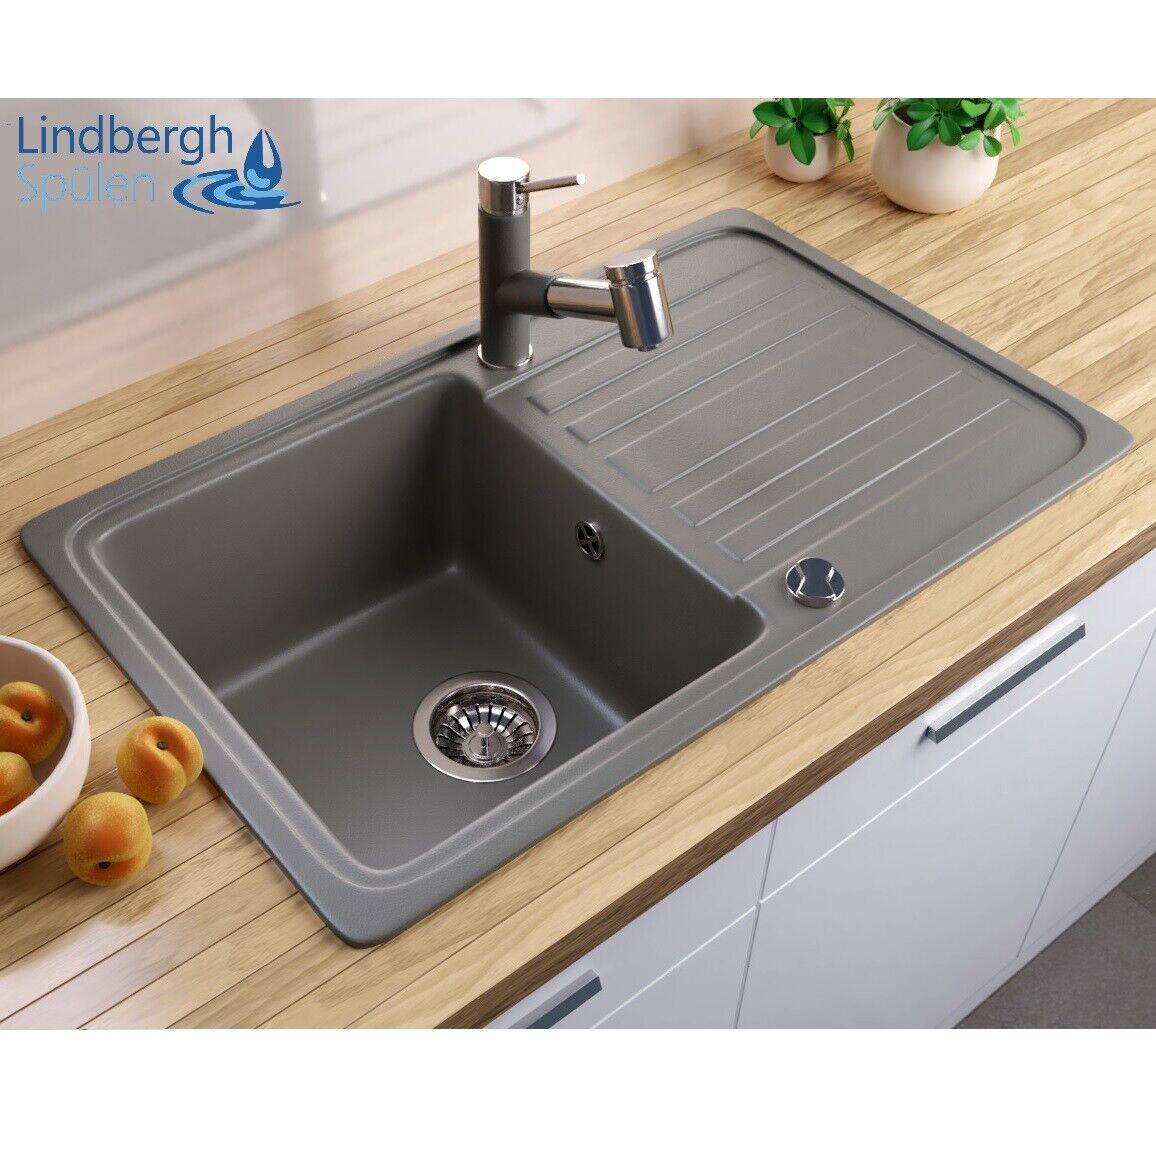 "LINDBERGH® Granitspüle ""LUN"" inkl Siphon Einbauspüle Küchenspüle"